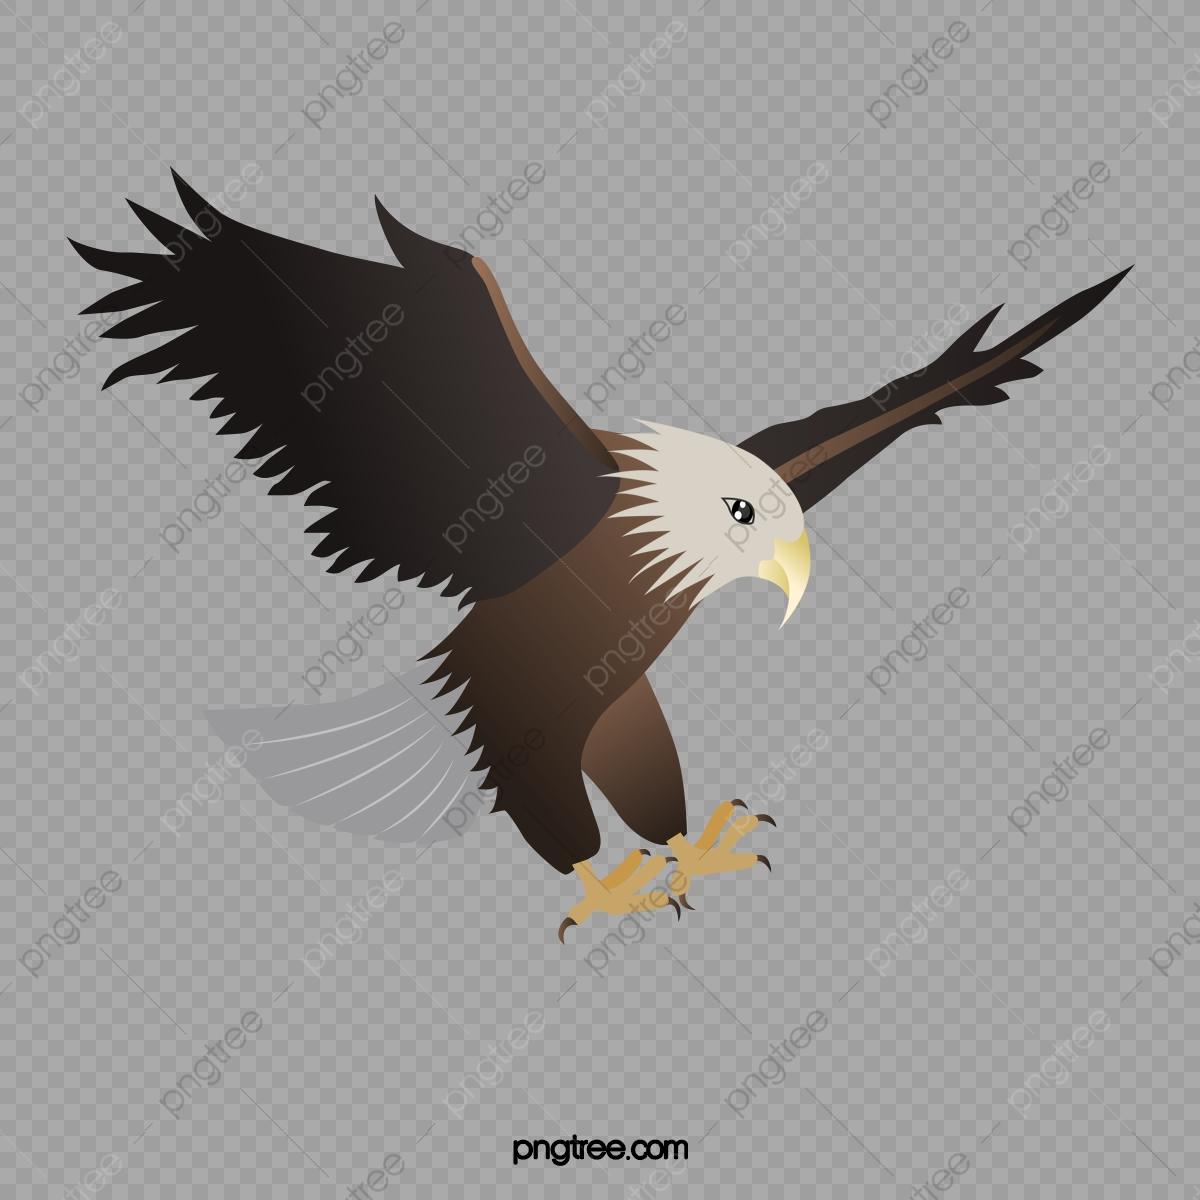 Eagles clipart sky. Flying eagle fly animal